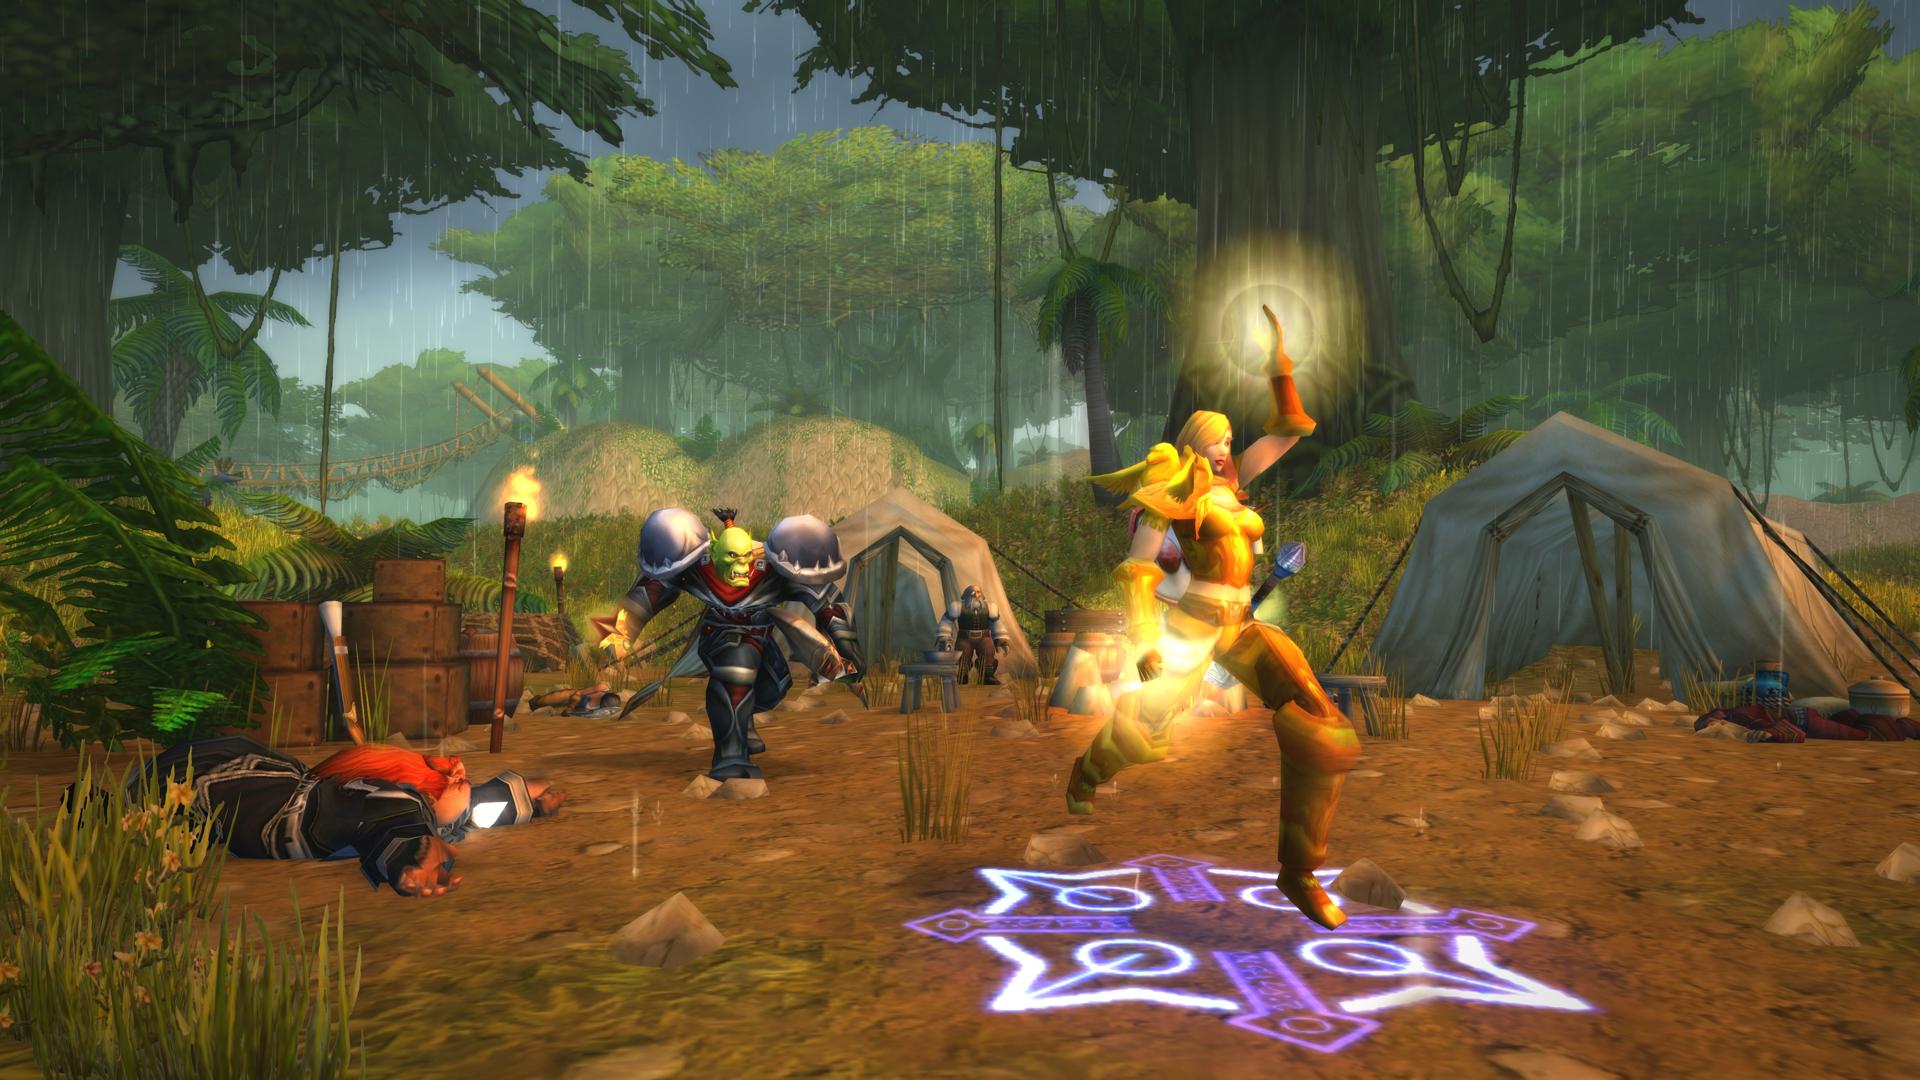 ClassicLaunch_WoW_STV_1920x1080.jpg - World of Warcraft